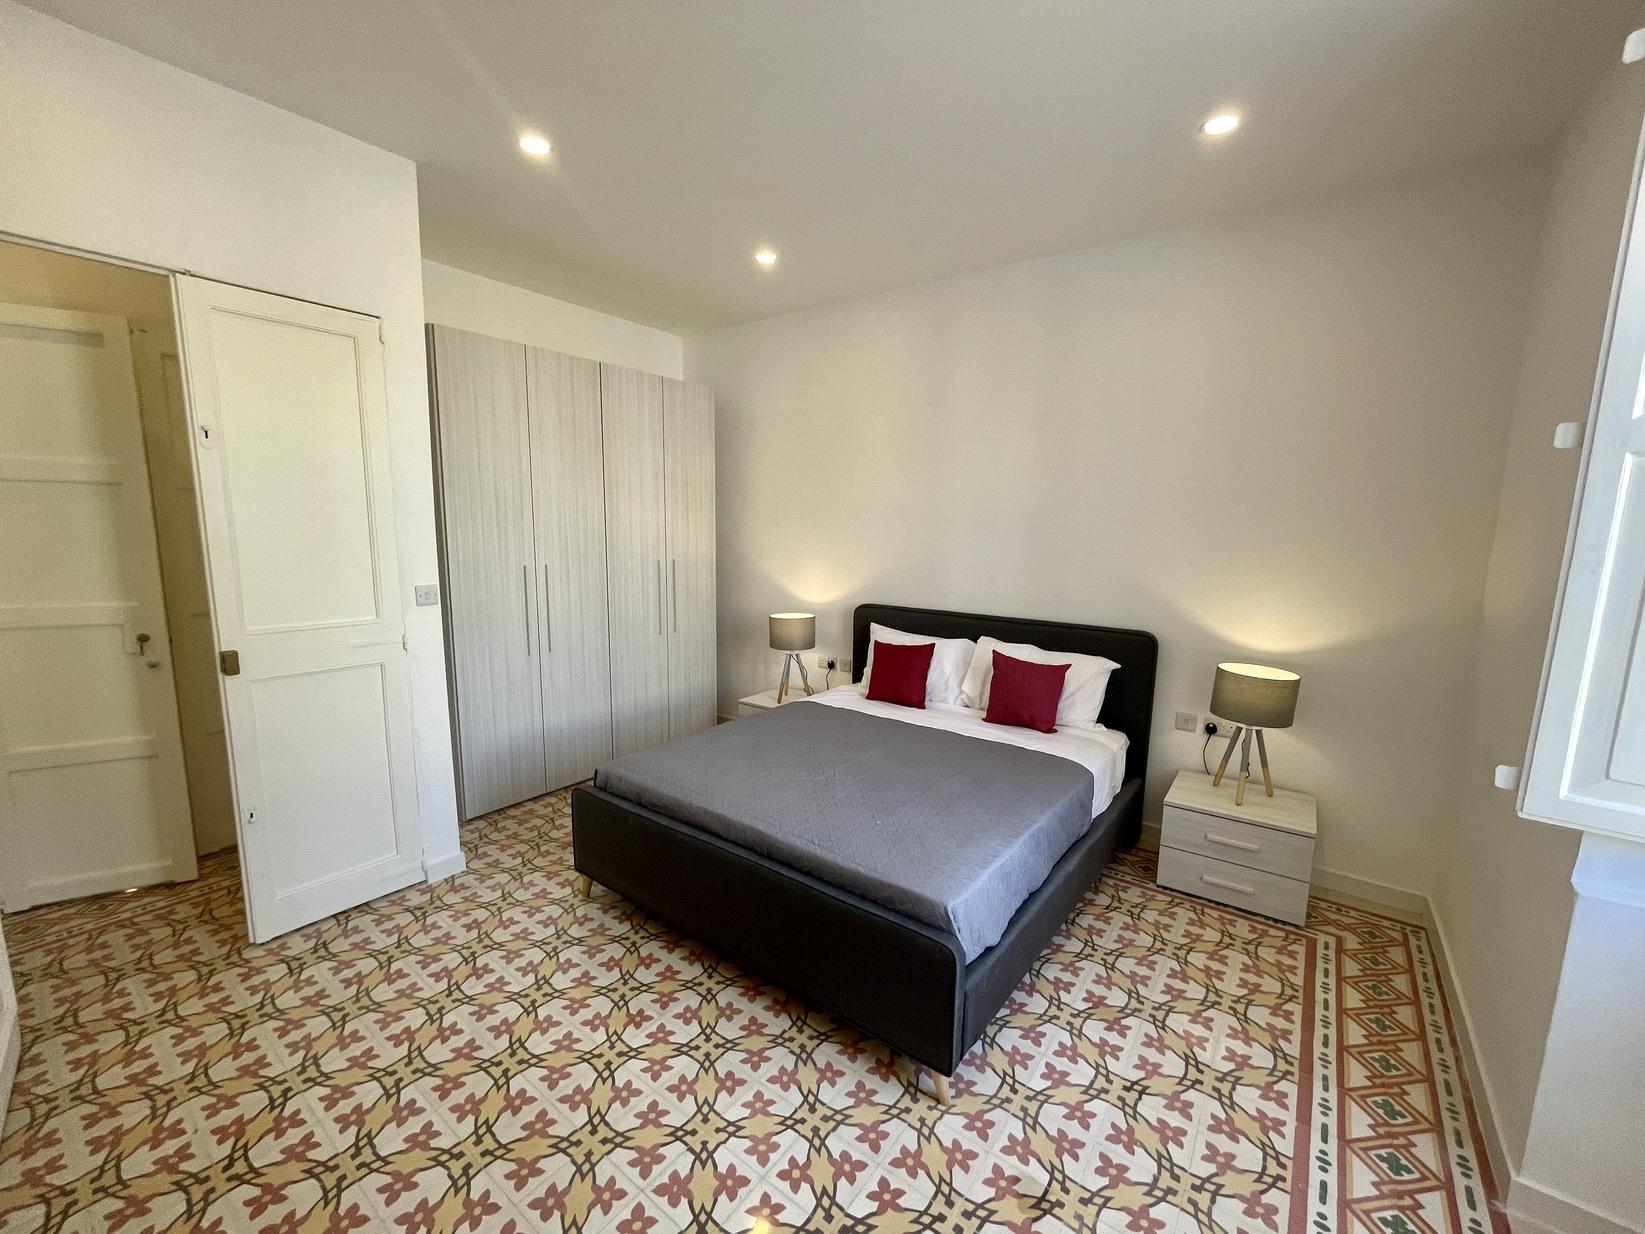 3 bed Town House For Rent in Kalkara, Kalkara - thumb 9